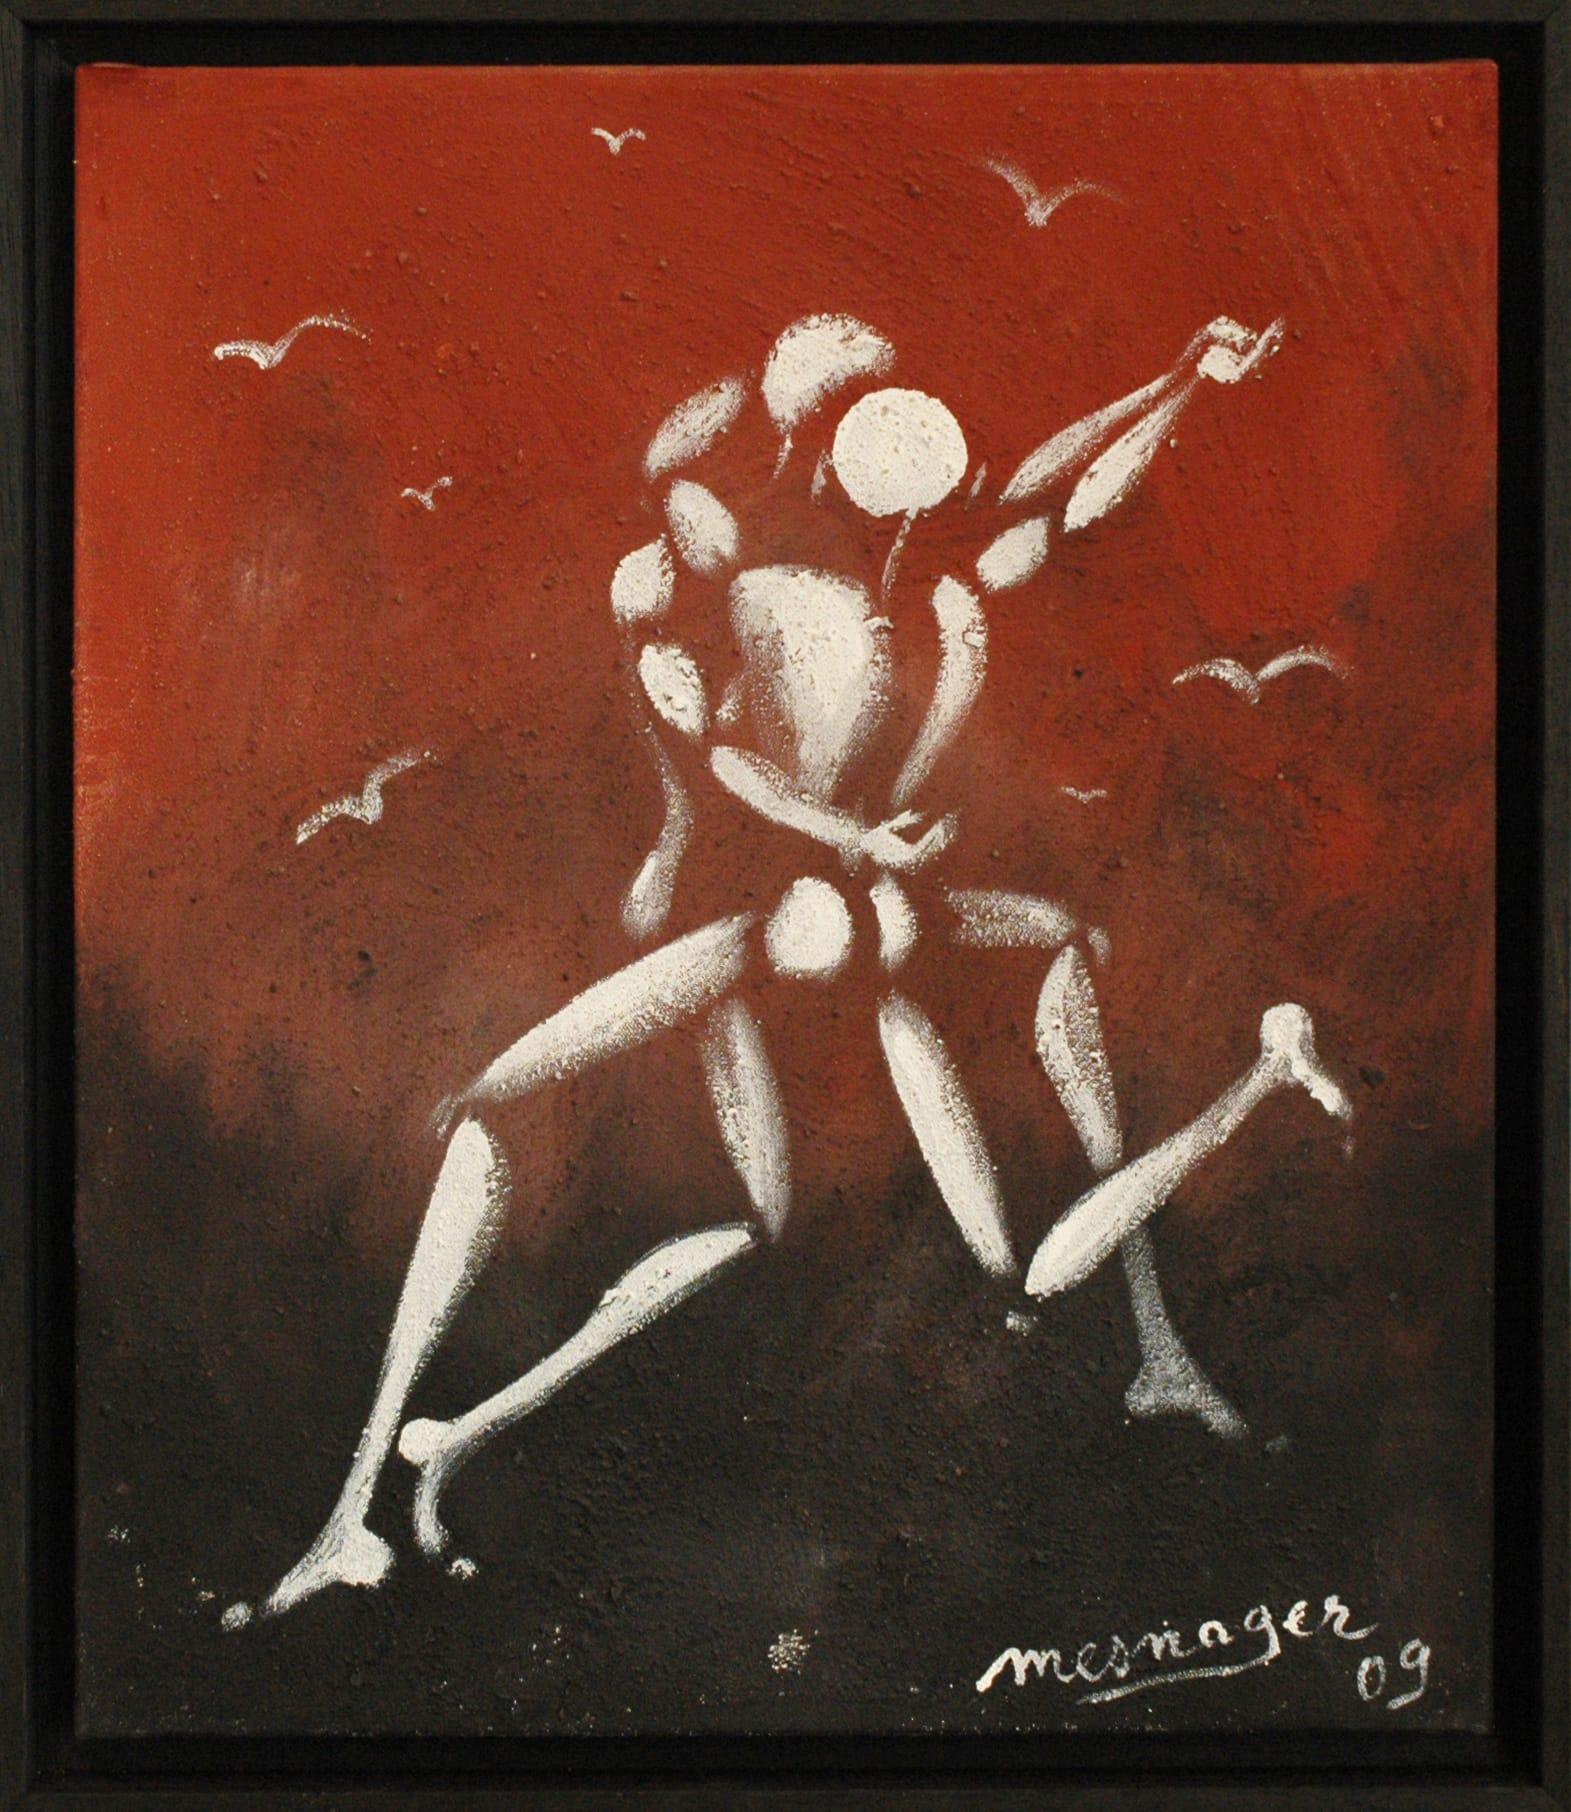 Galerie Art Jingle Mesnager Danse Ardente 55 x 46 cm 2009